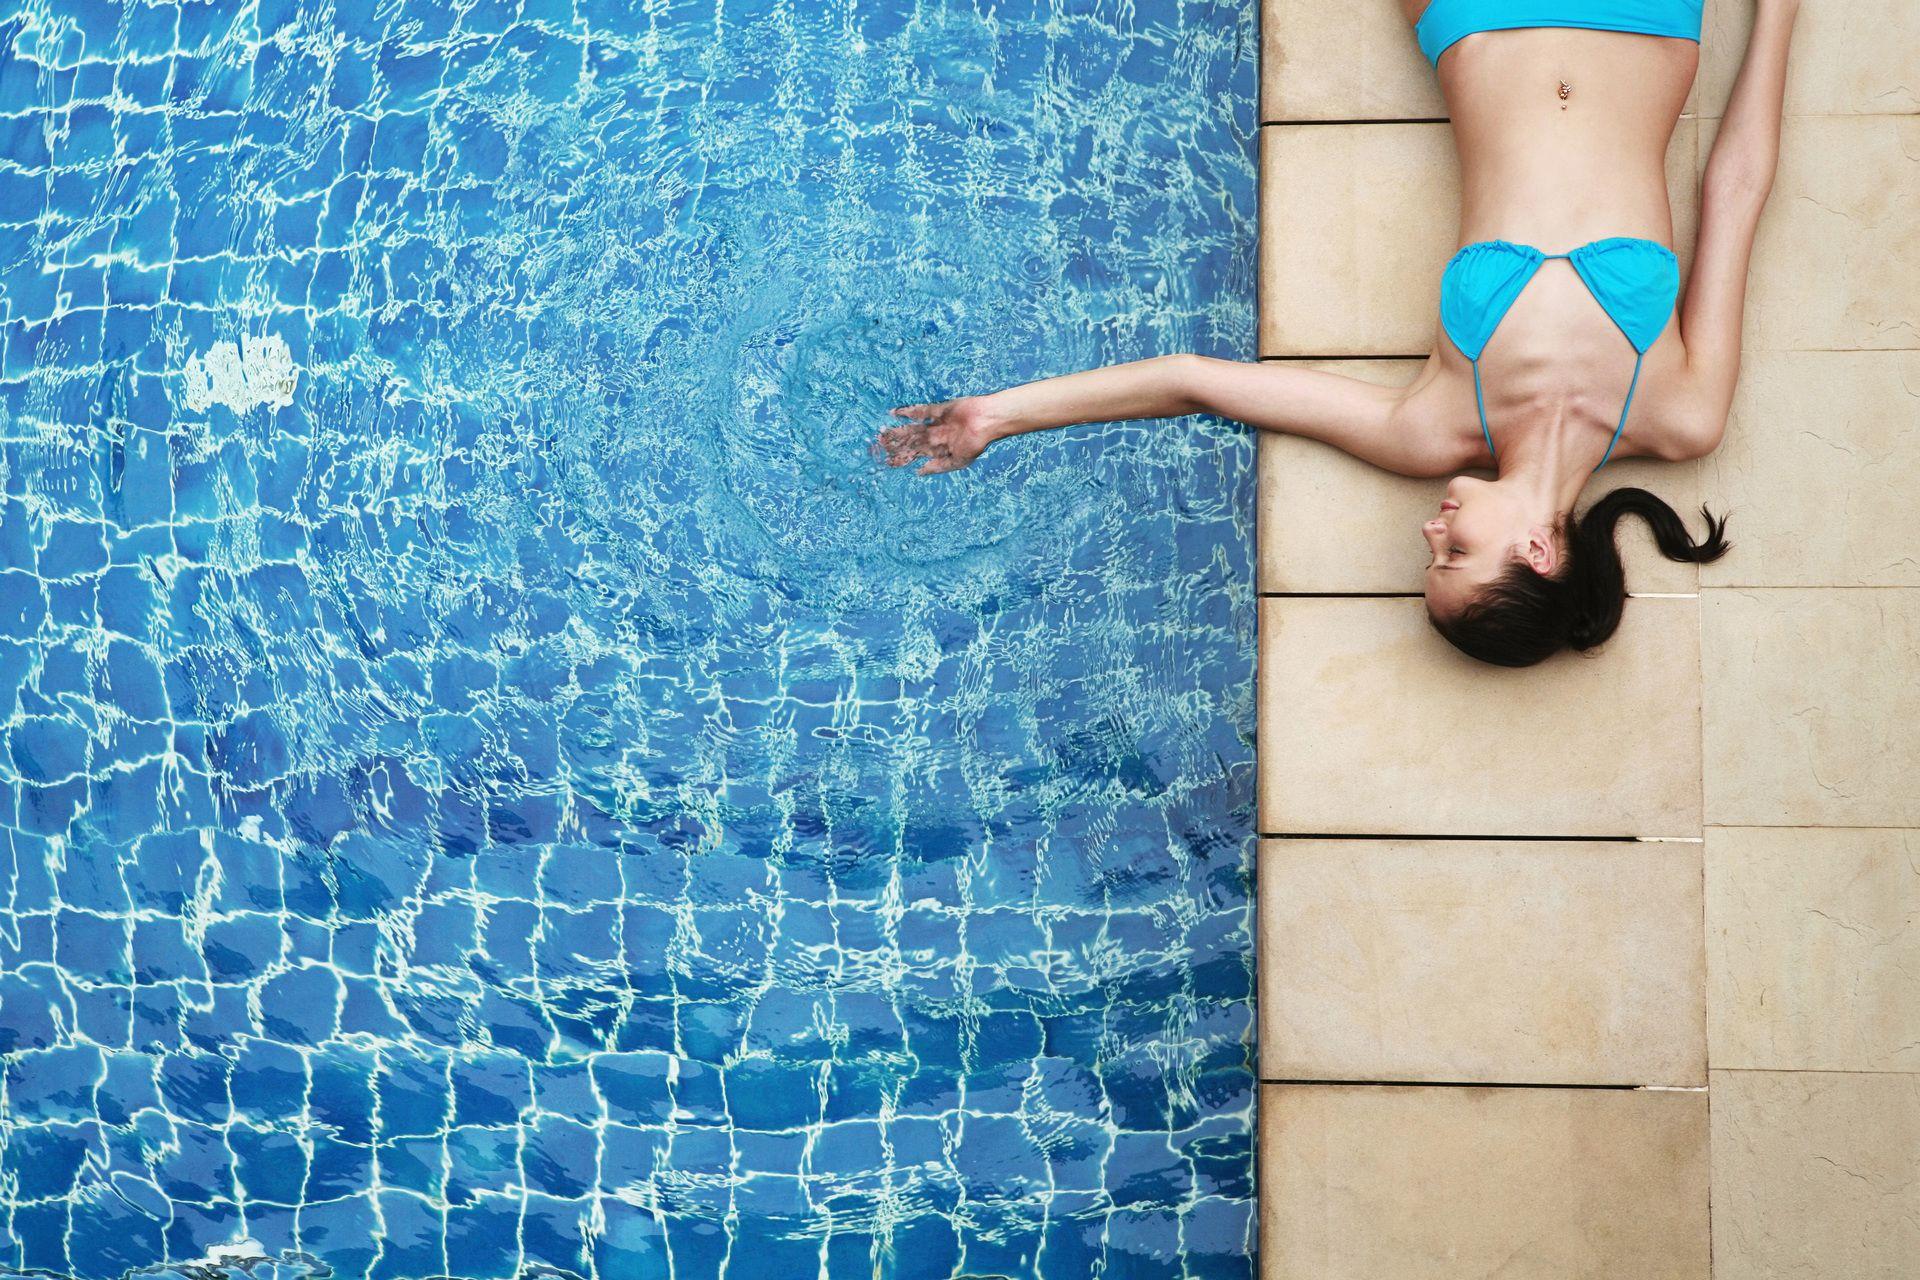 comment-chauffer-piscine